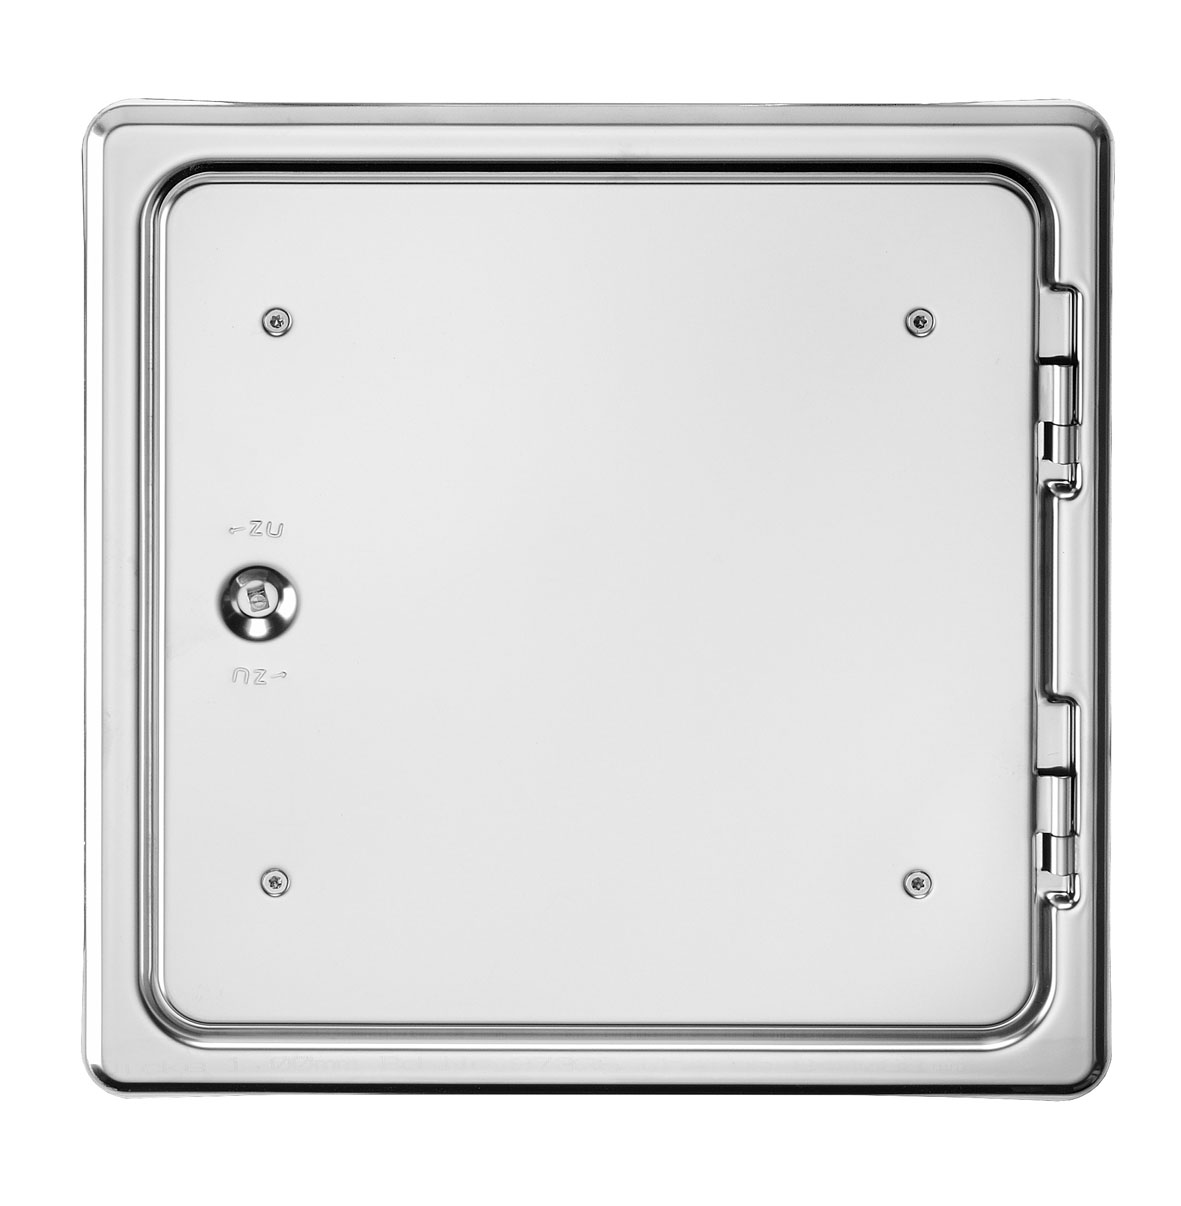 Kamintür K29/4 Edelstahl Vierkantverschluss Einbaumaß 300x300mm Bild 1